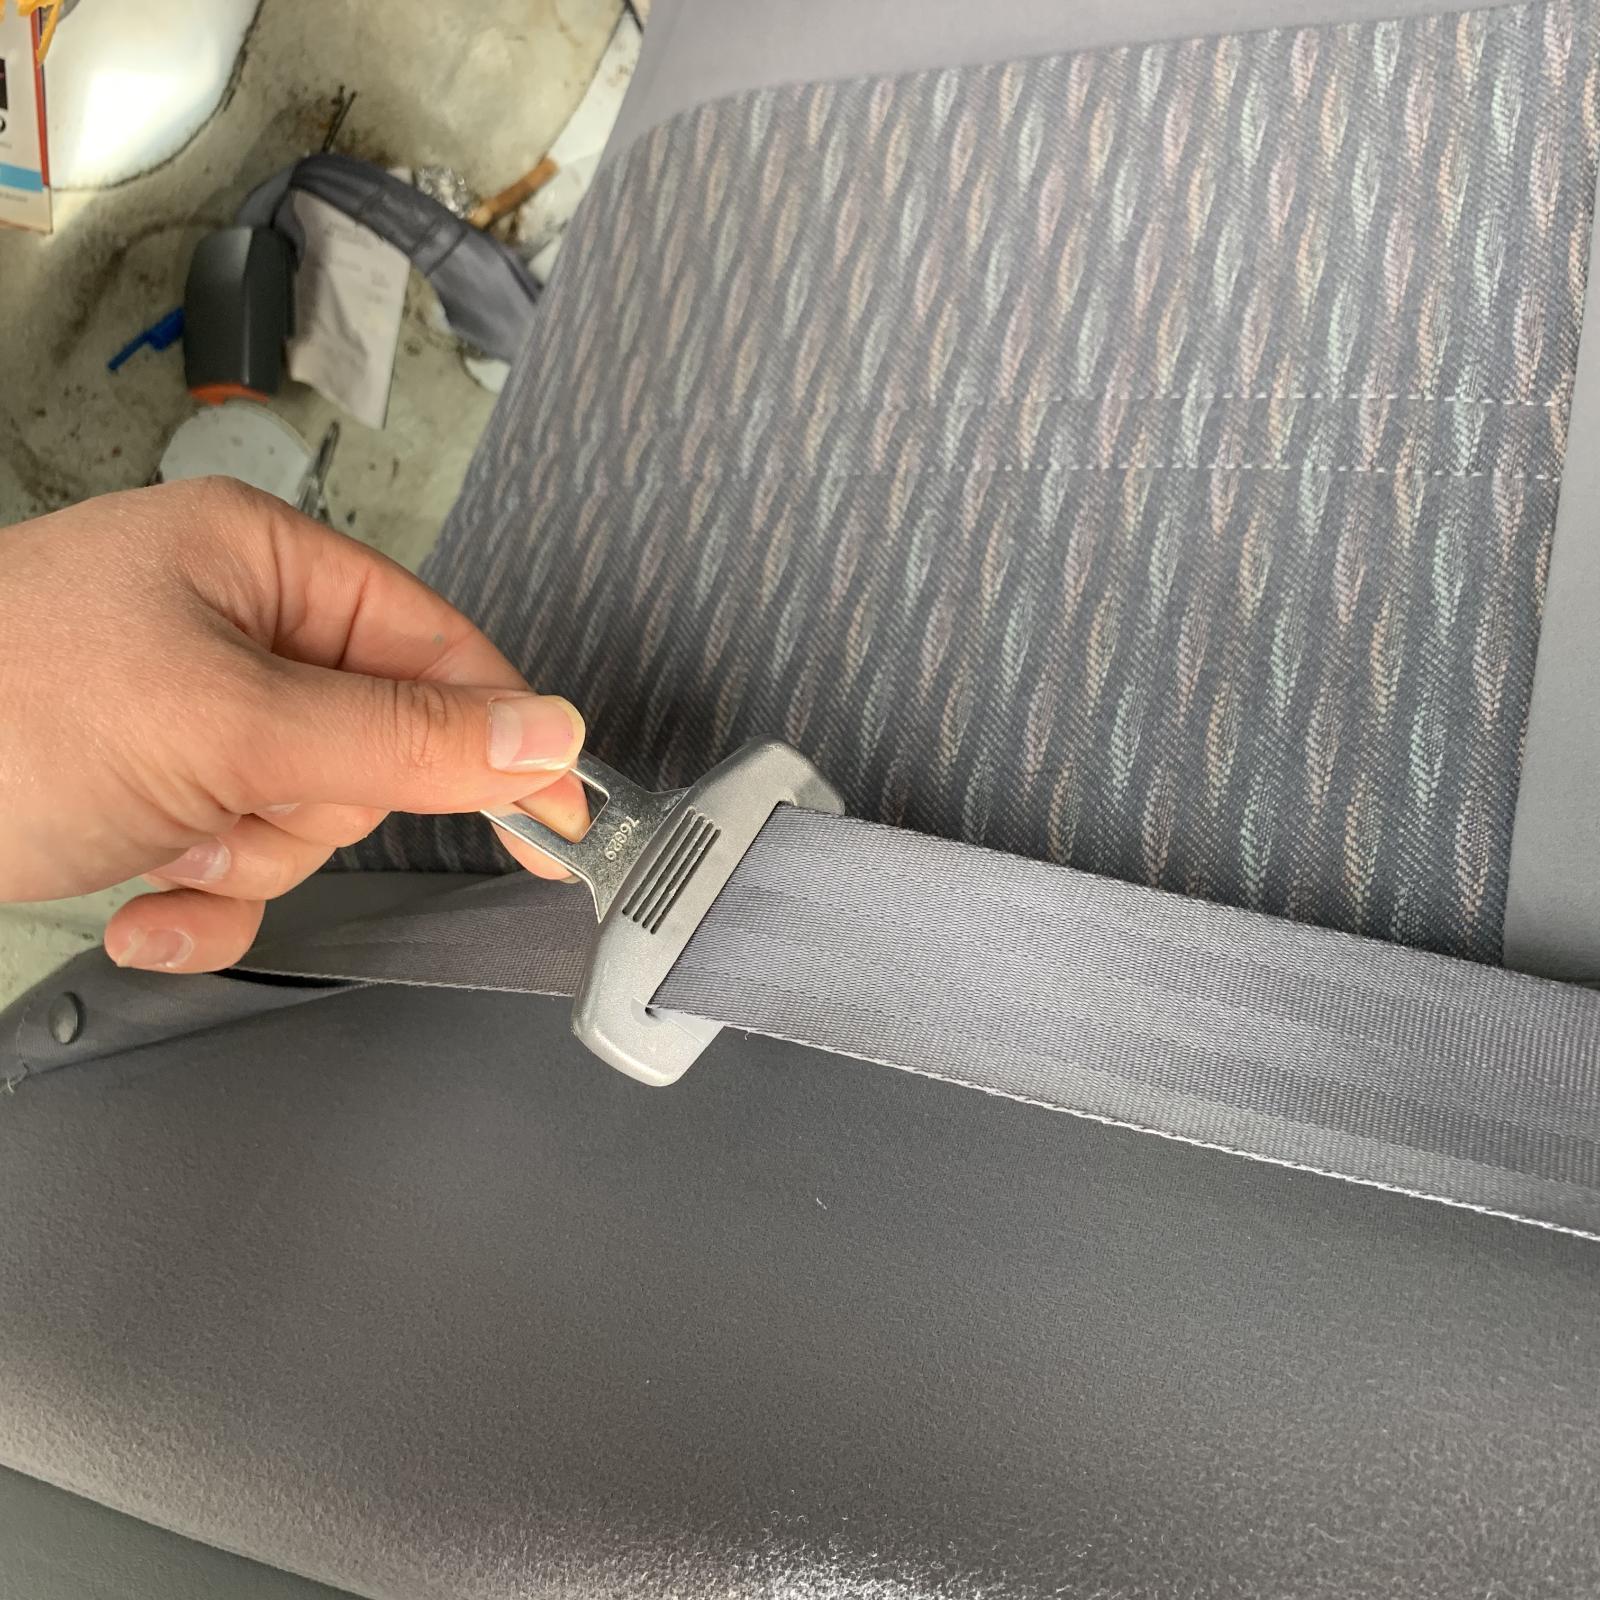 TOYOTA CAMRY, Seatbelt/Stalk, LH REAR, SEAT BELT ONLY, SK20, SEDAN, 08/97-08/02